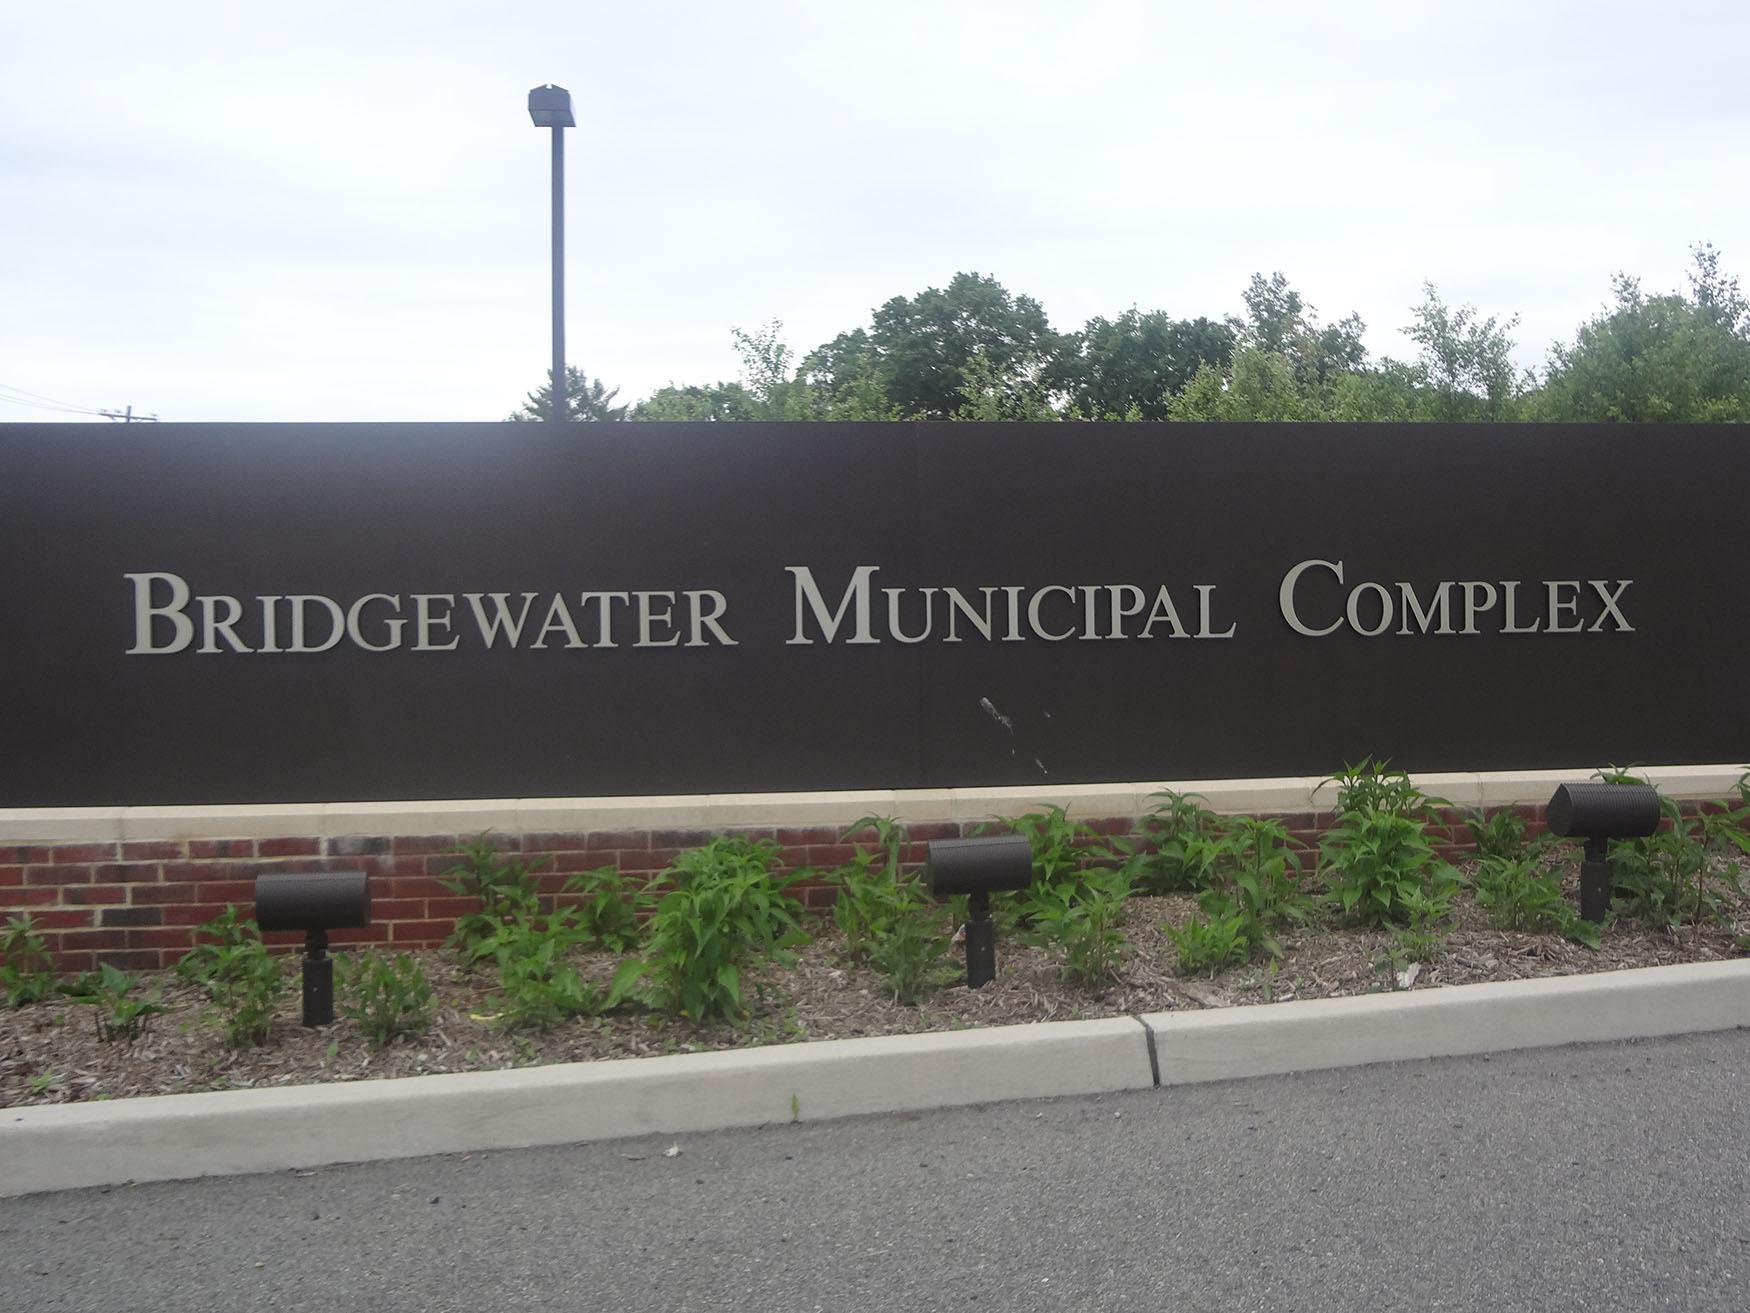 31932e397db245bb703d_Bridgewater_municipal.jpg